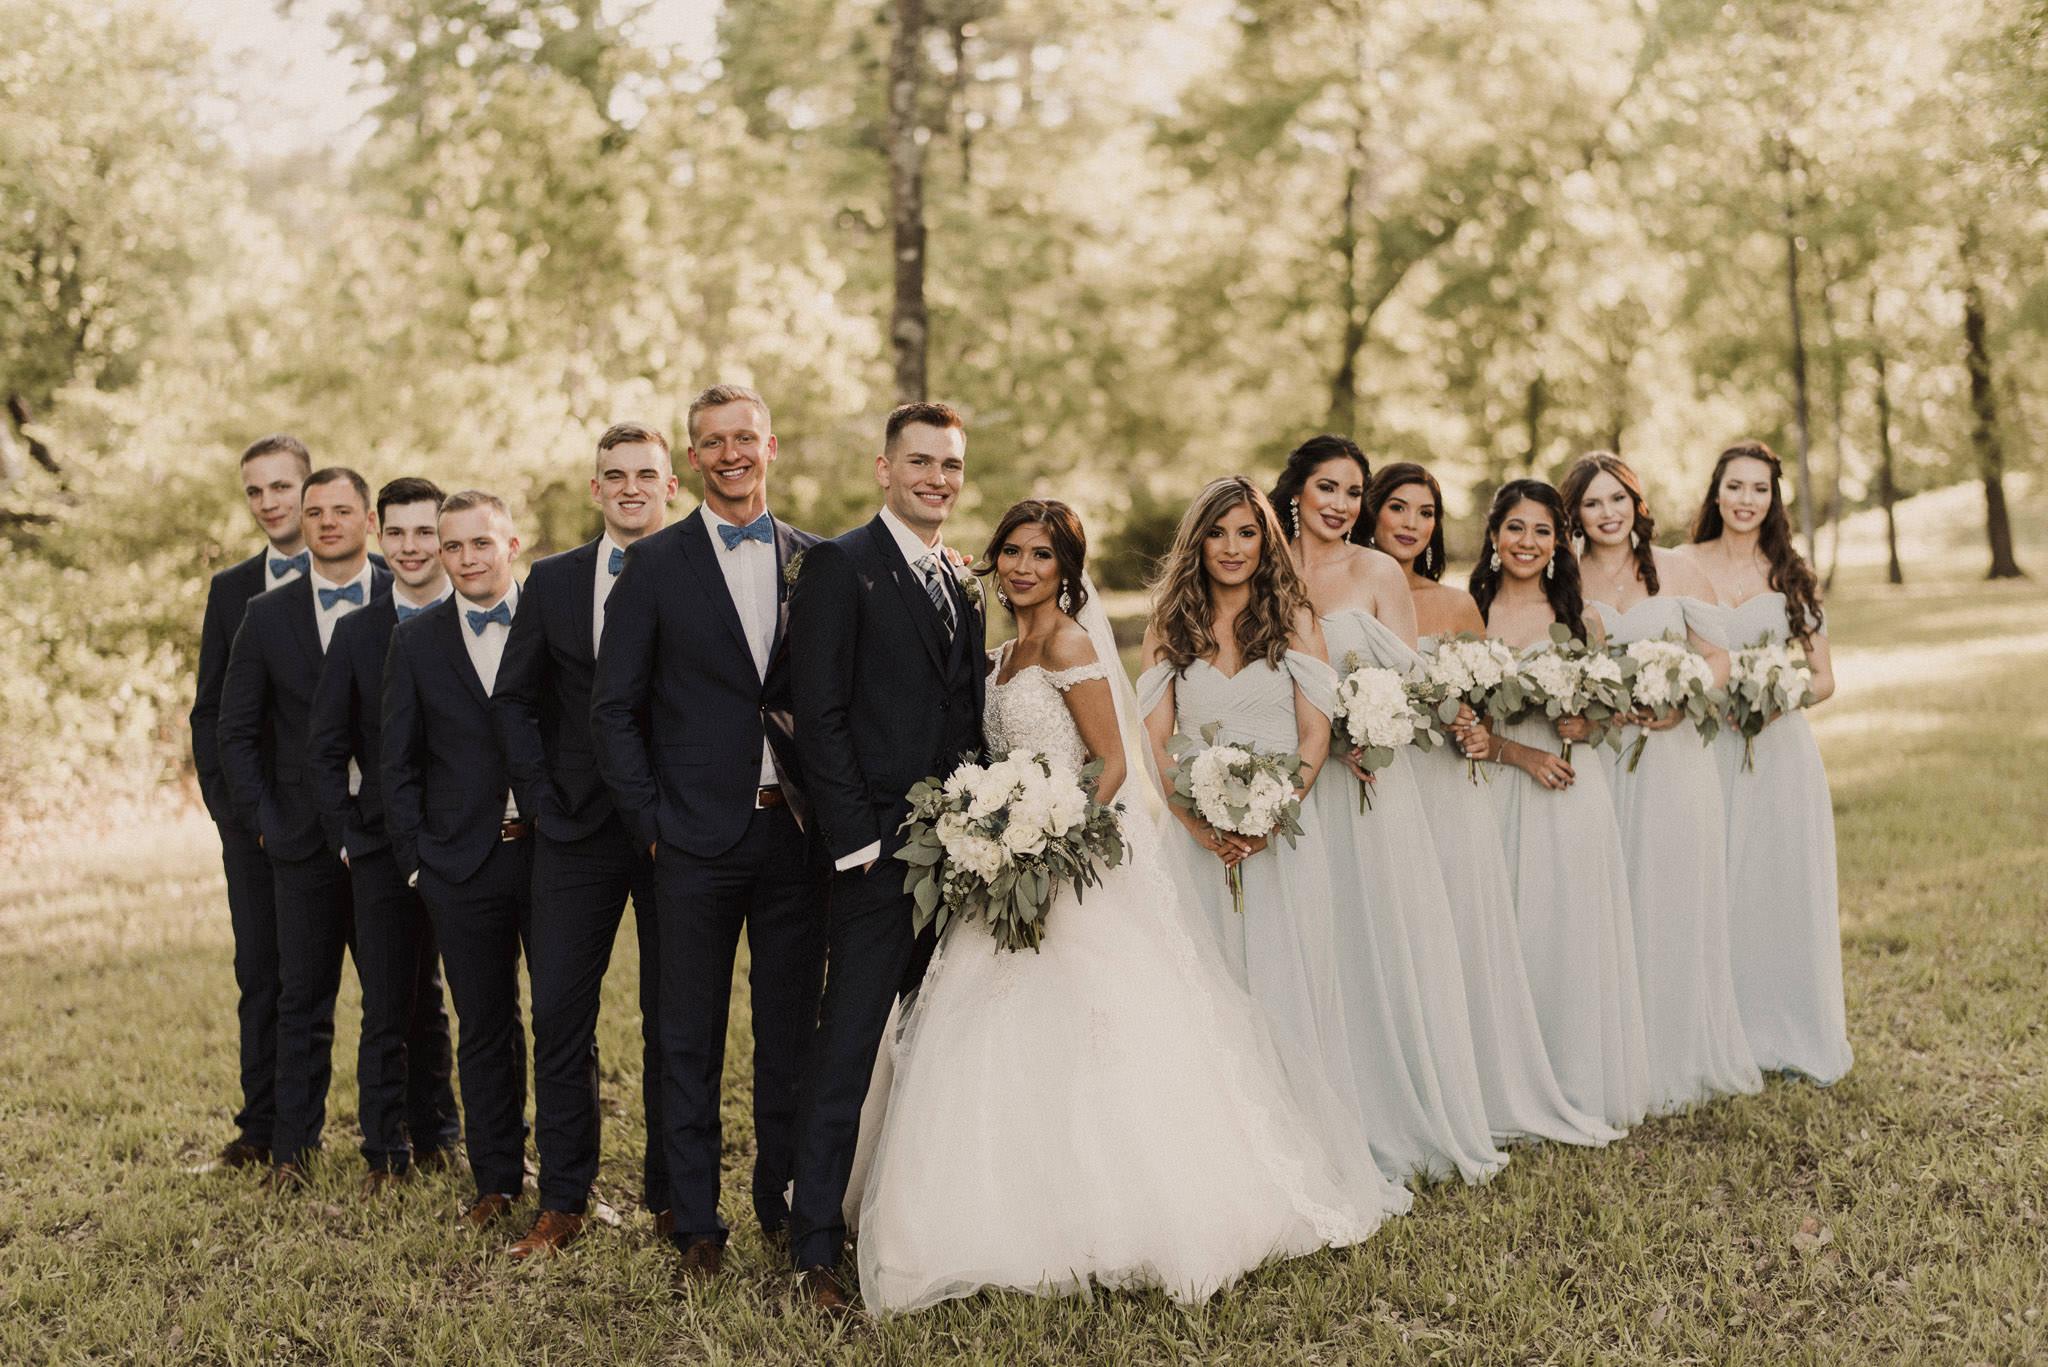 adriana-christian-wedding-re-sm-99.jpg